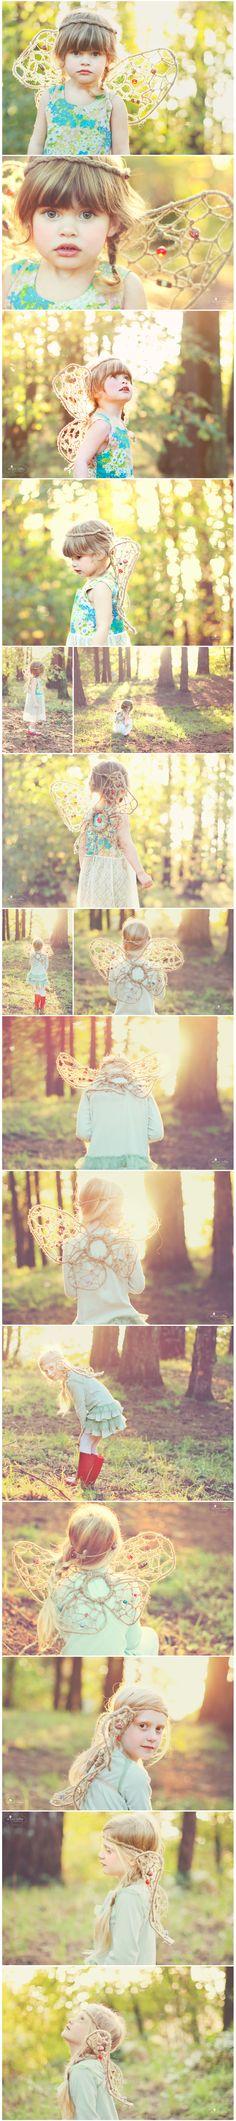 outdoor + handmade costume